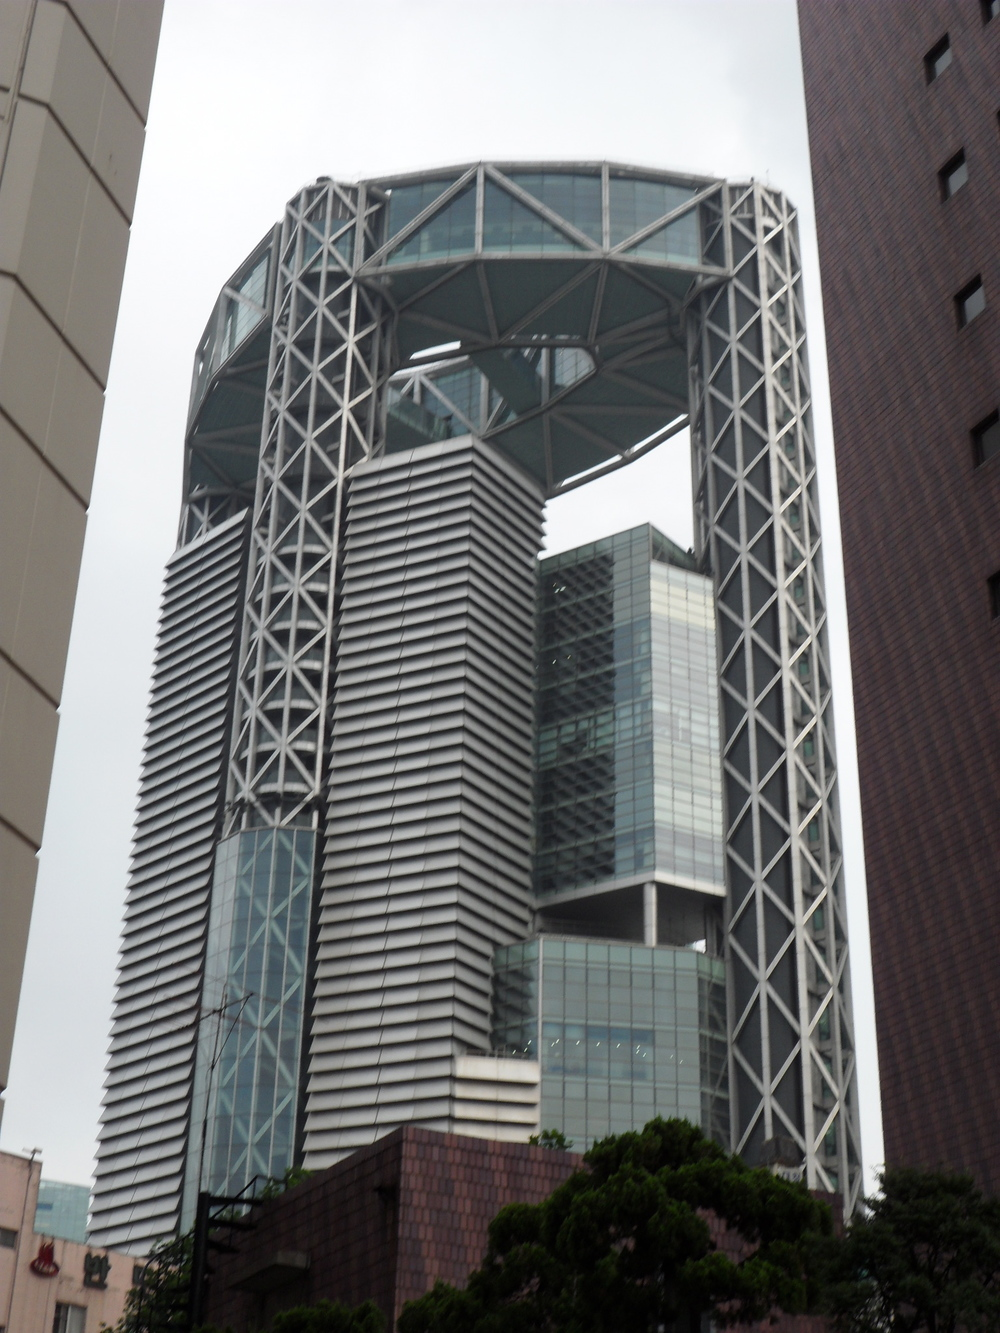 Fascinating architecture.